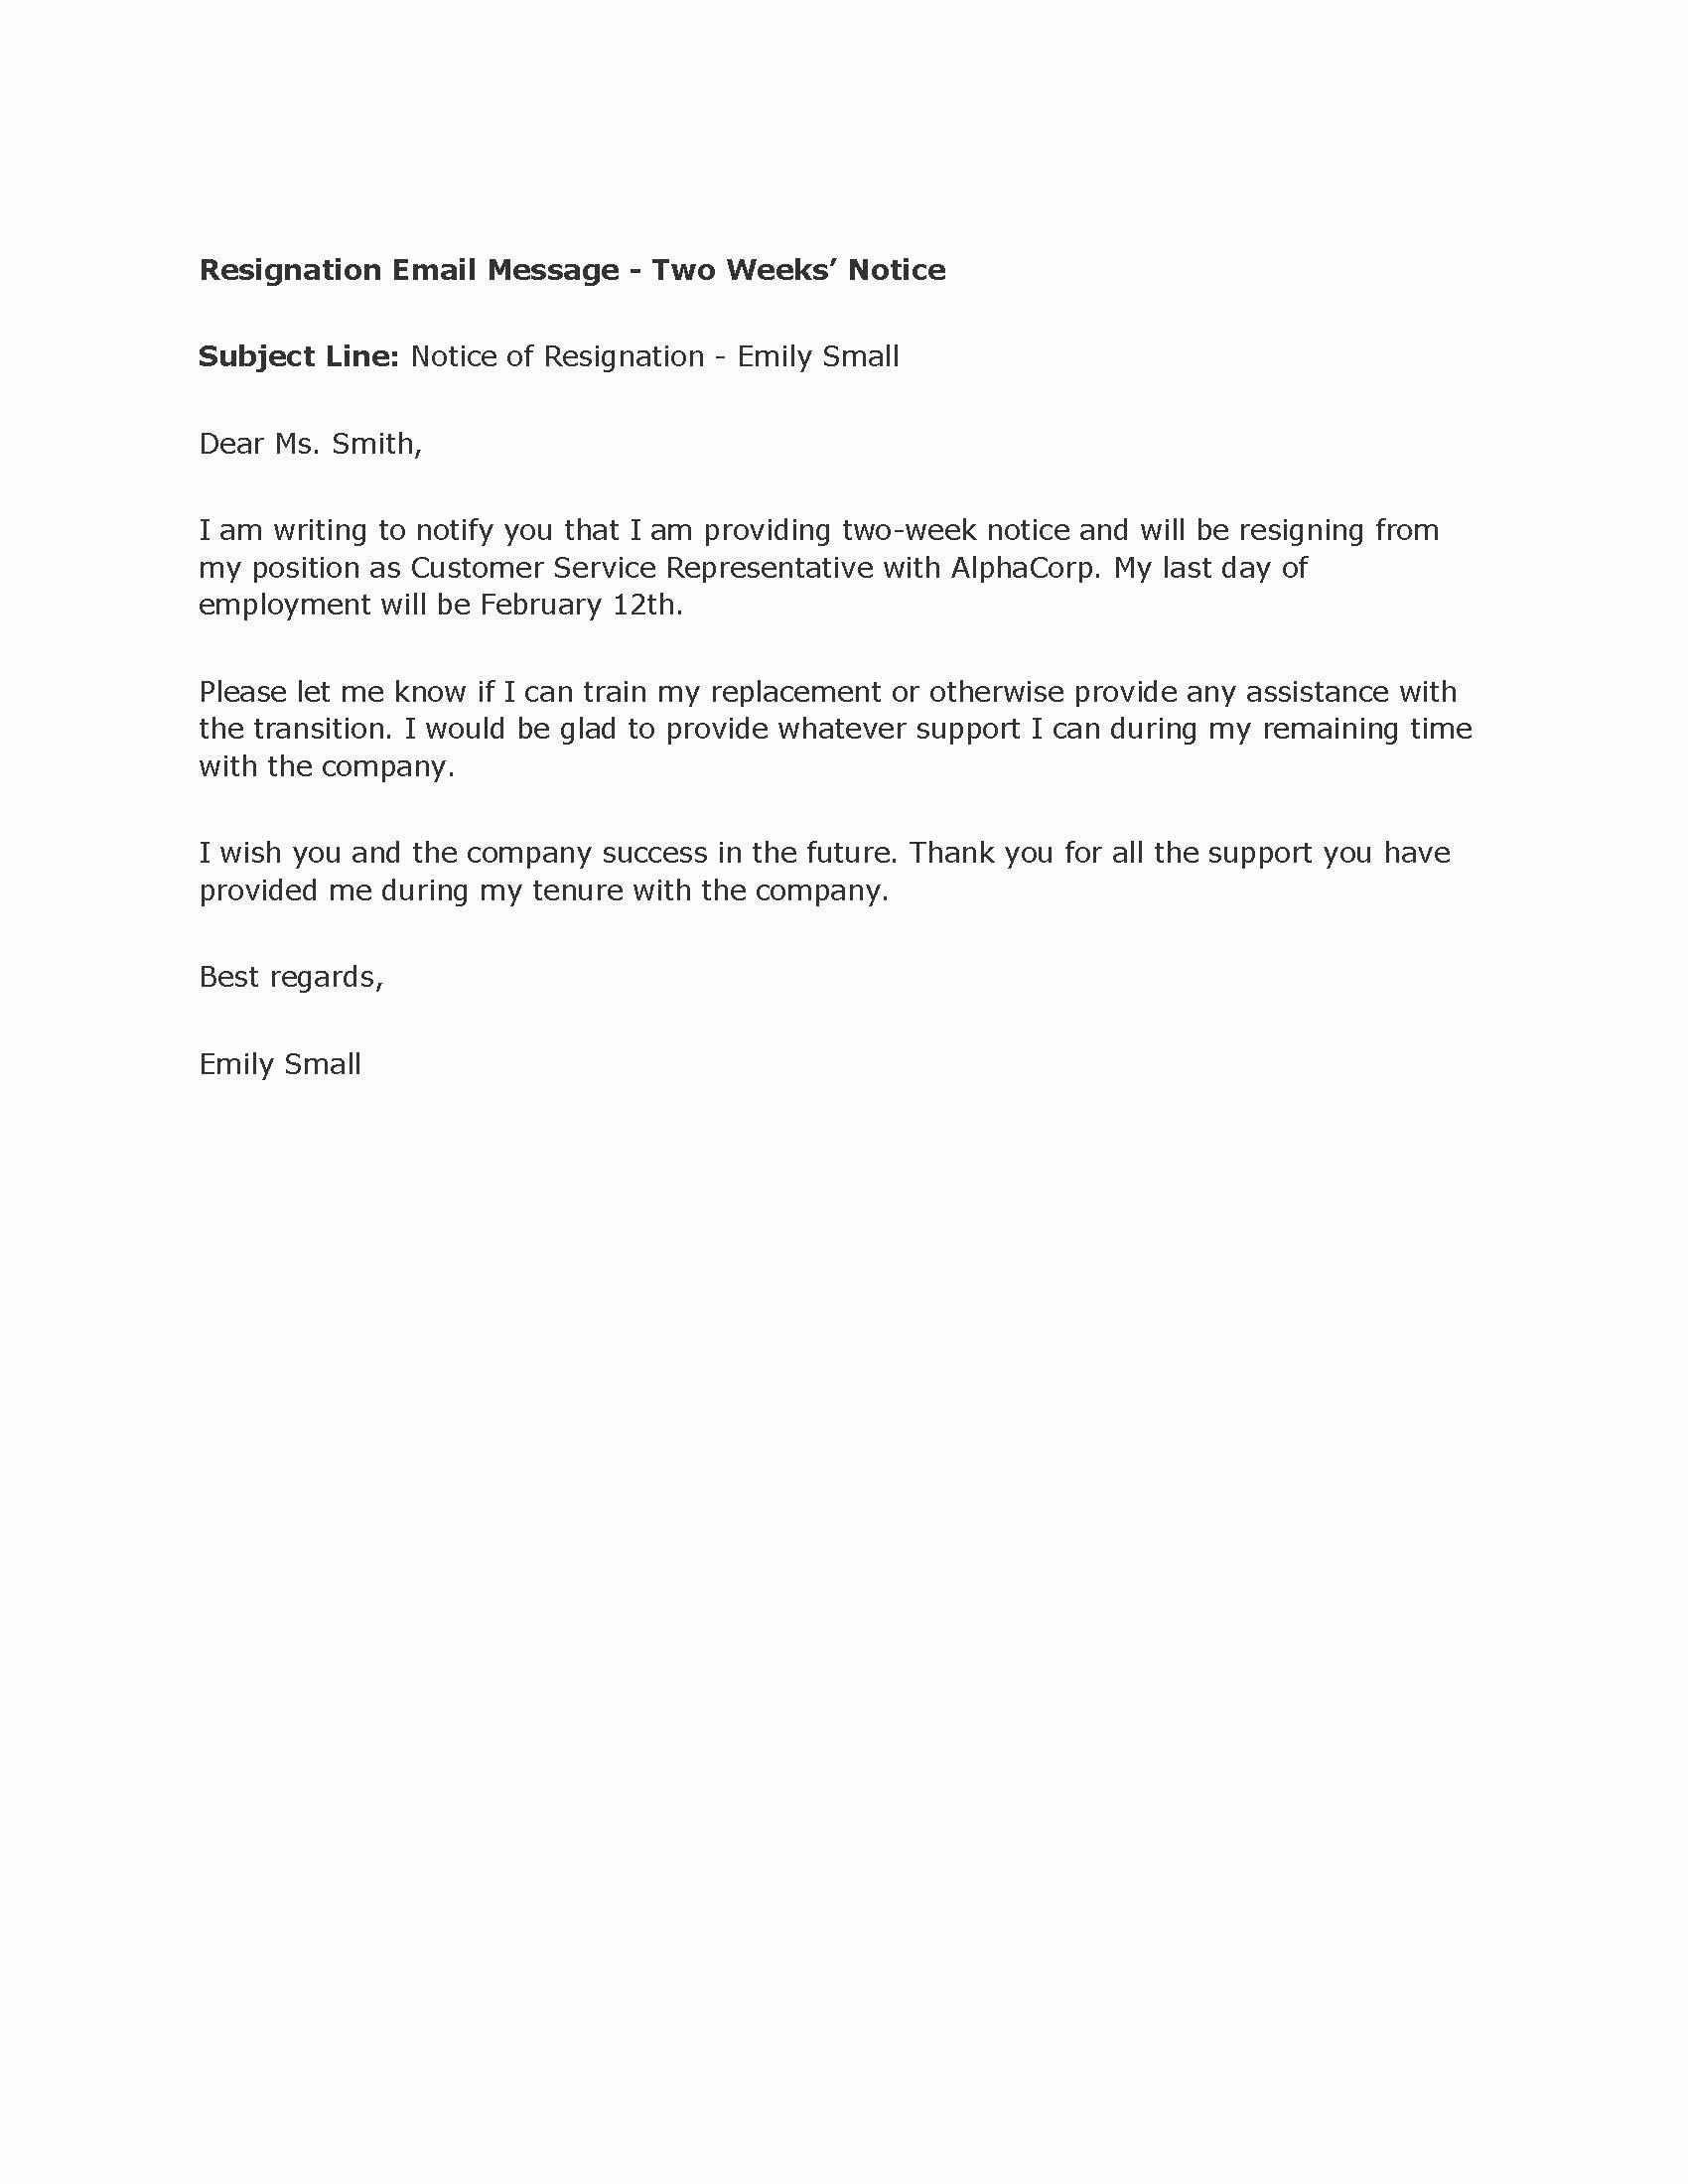 2 Weeks Notice Letter format Inspirational Professional Two Weeks Notice Letter Templates